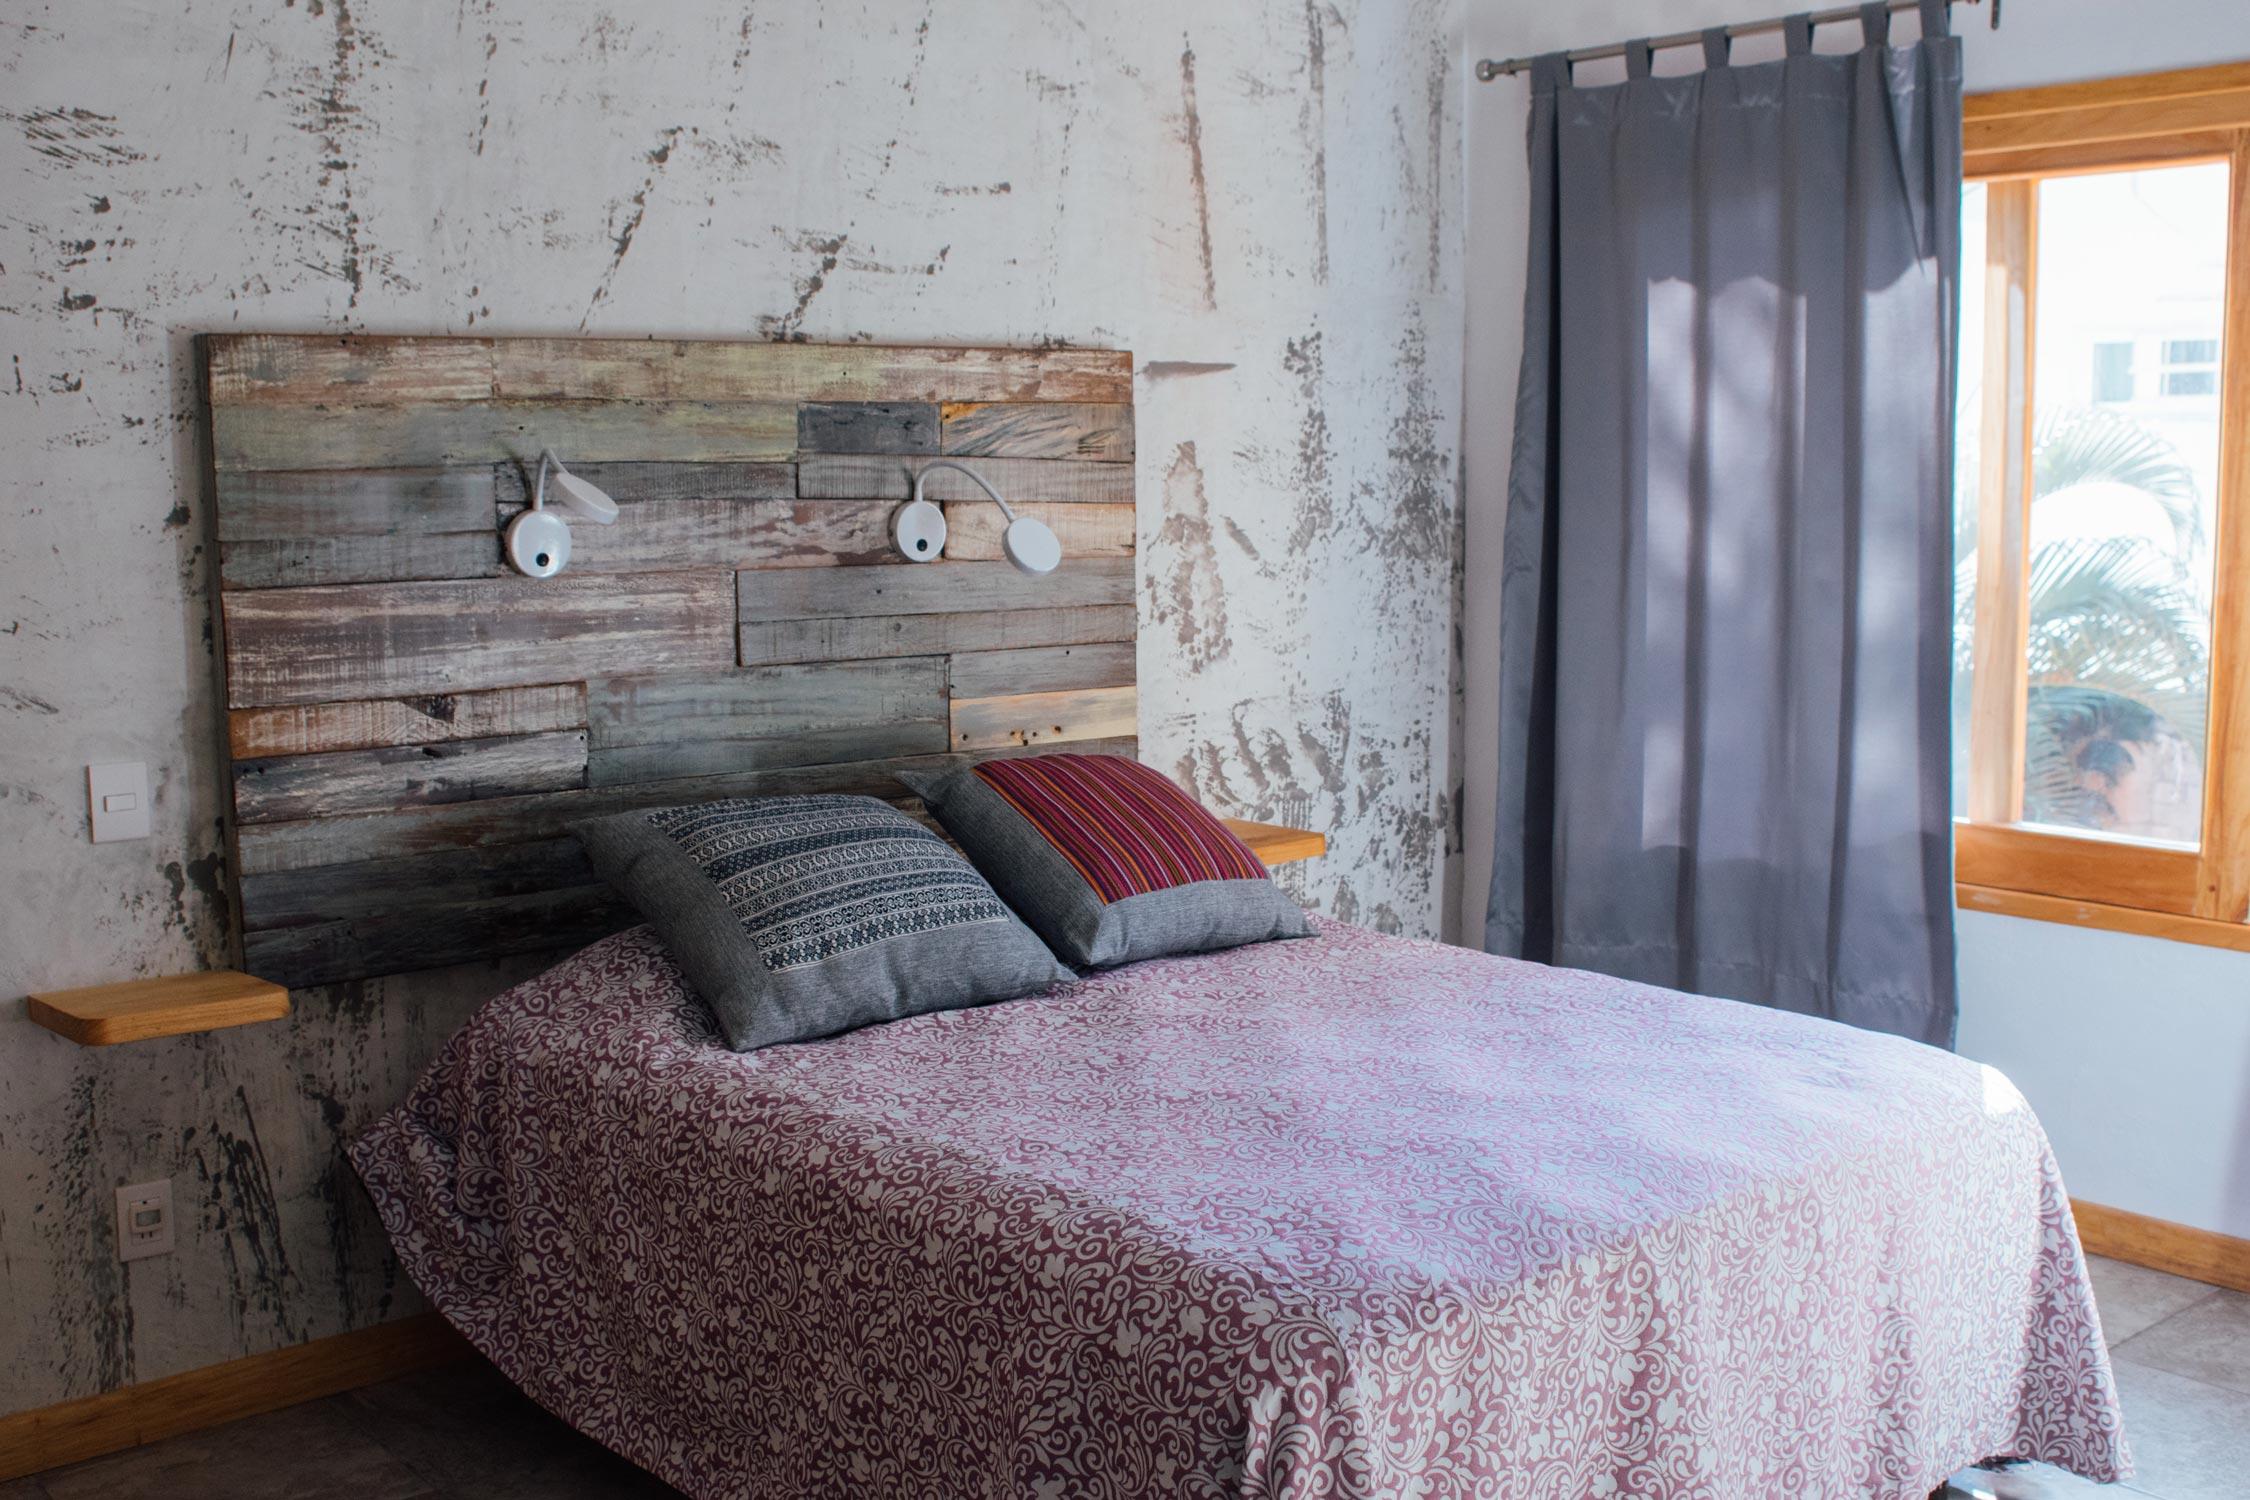 bungalow4-bed.jpg